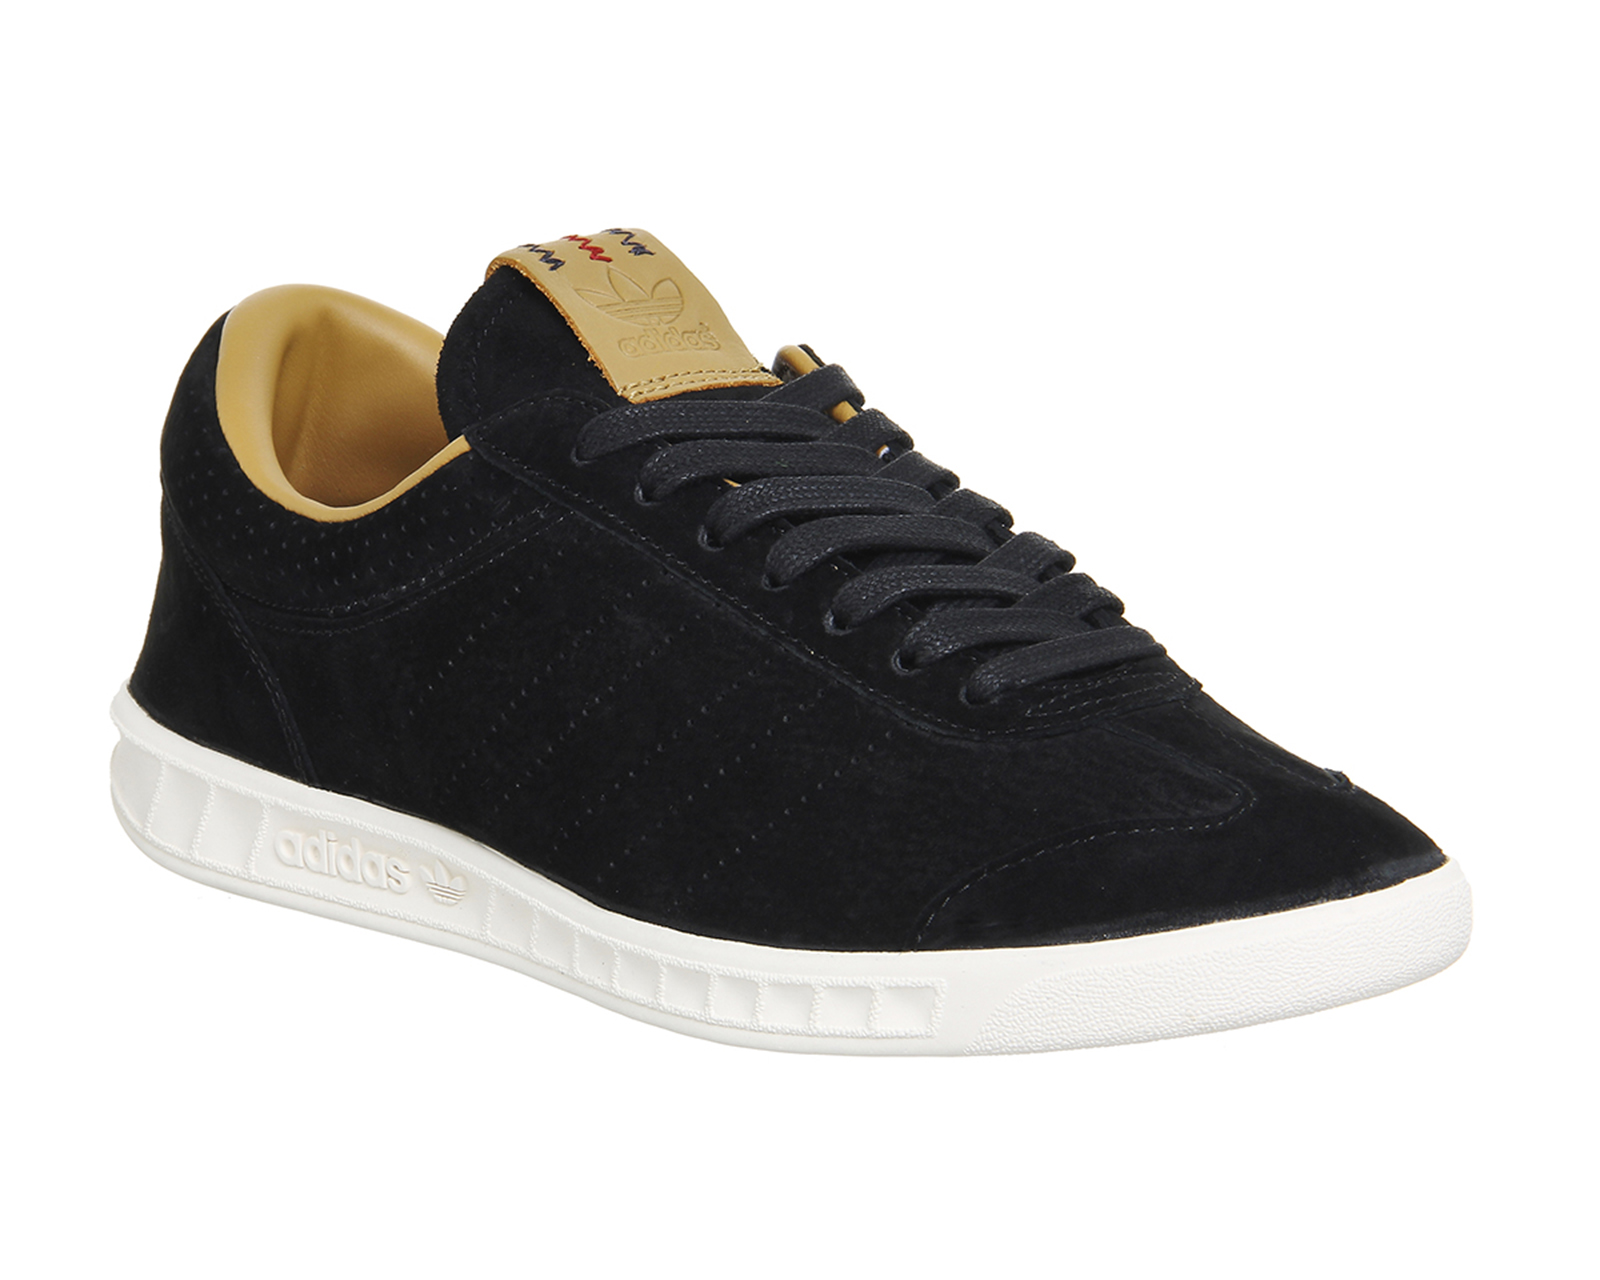 Adidas Hamburg Freizeit Black Trainers Shoes Ebay